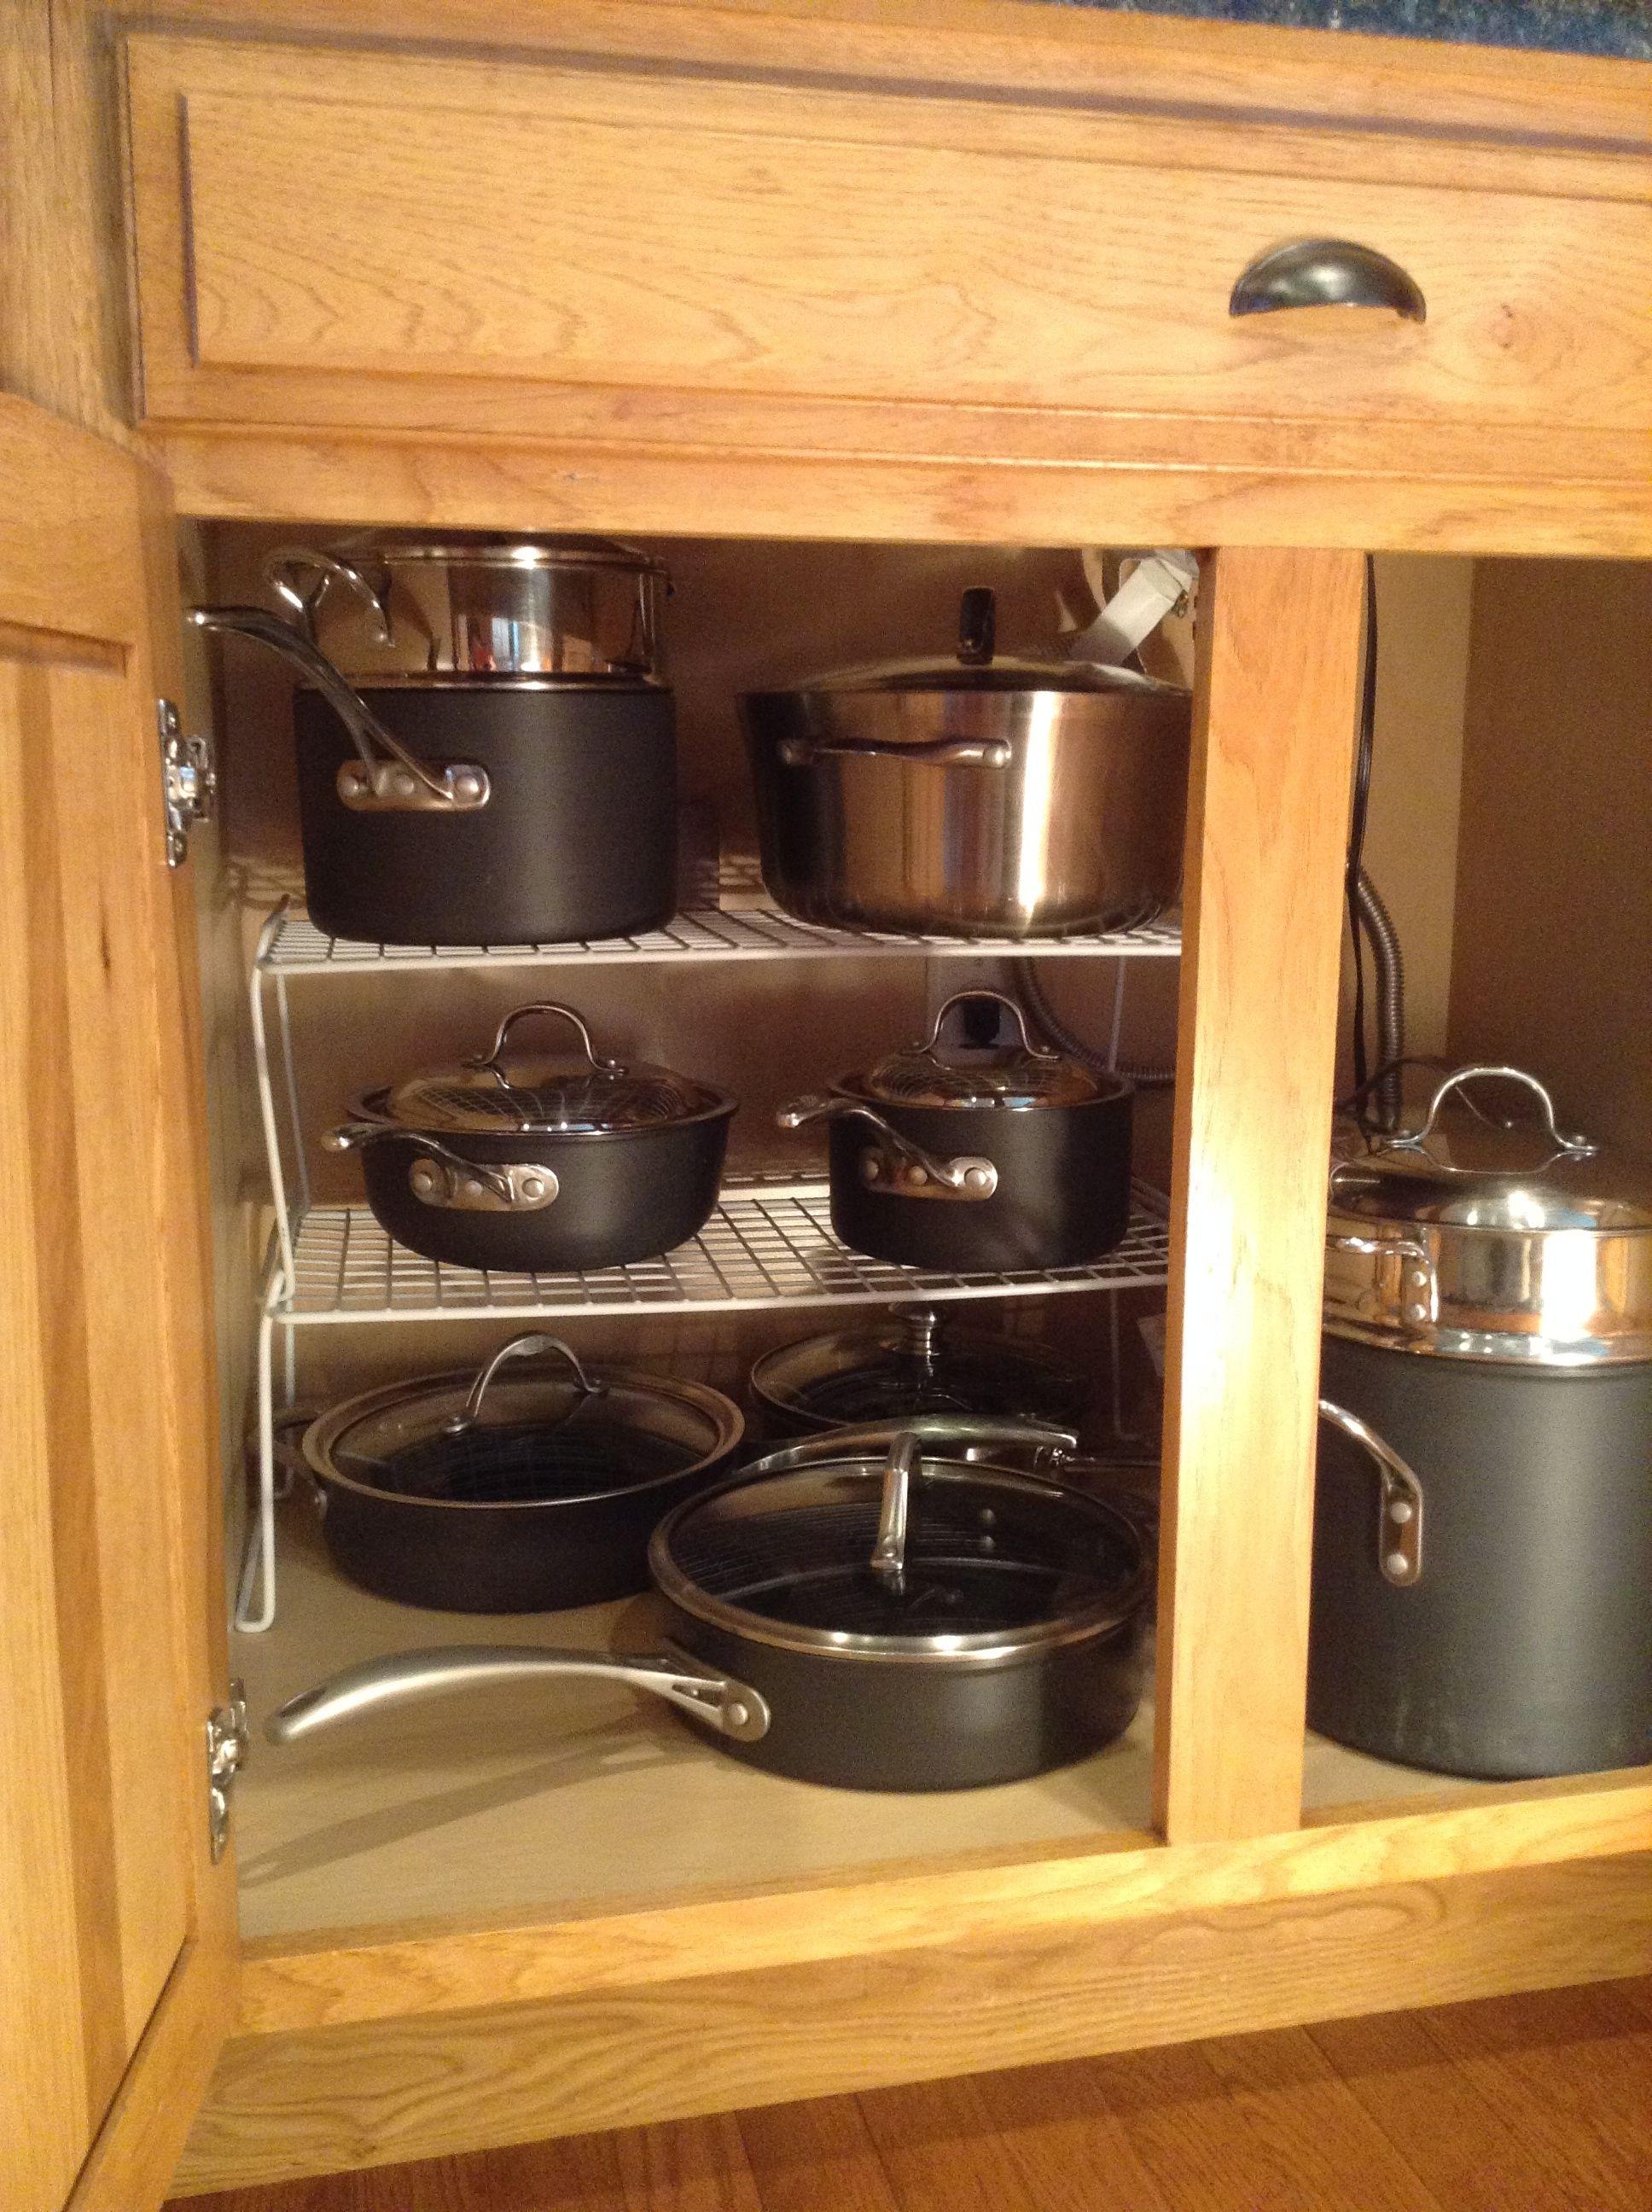 Stackable Shelves Chaos Ordered Stackable Shelves Shelves Organized Chaos